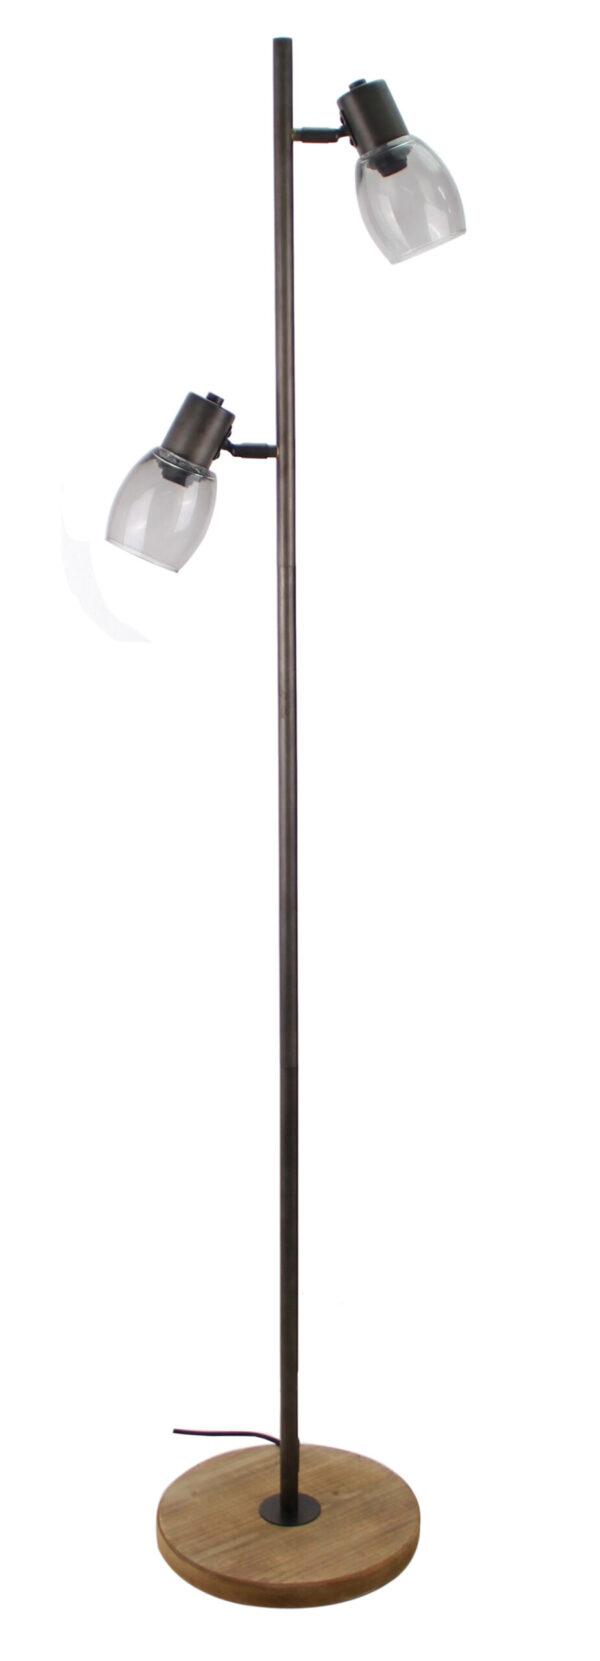 Sylvie staande lamp - 2 lichts - zwart black steel met vintage hout en smoke rookglas